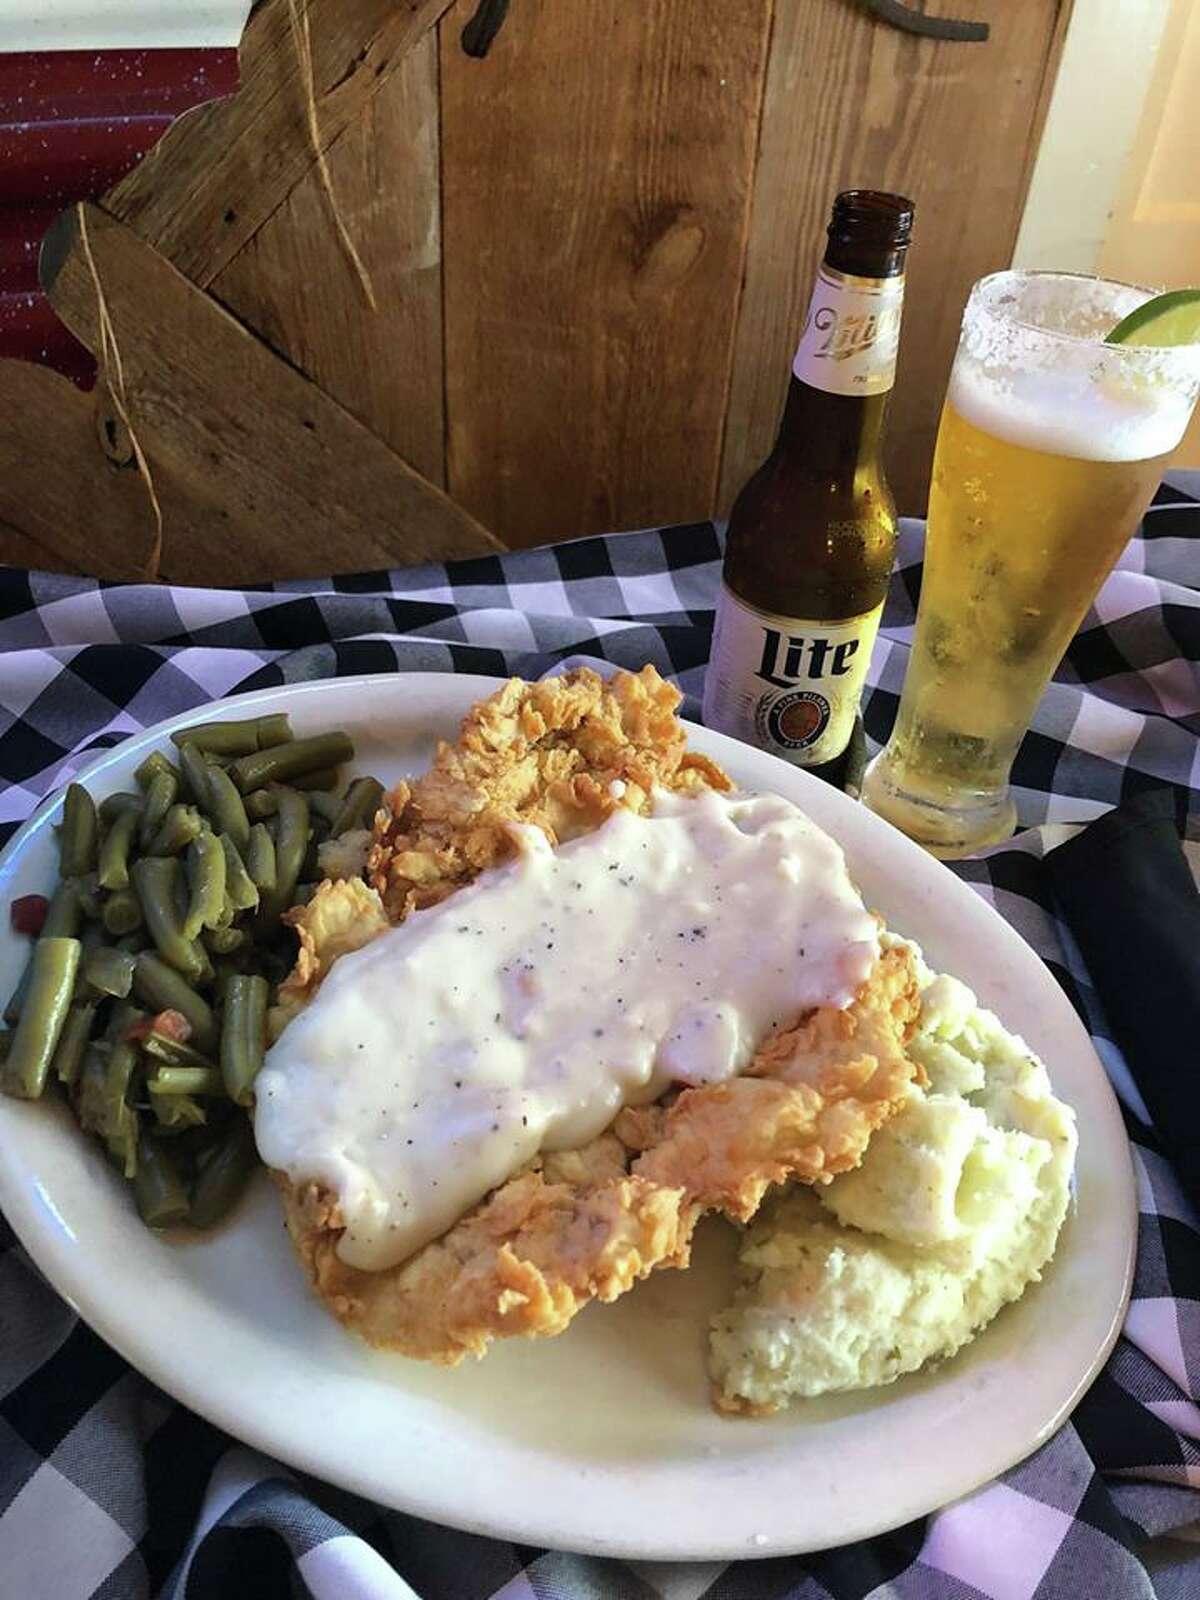 Old River City Cafe 2771 FM 725 New Braunfels, Texas 78130 (830) 620-1900 Closed Mondays